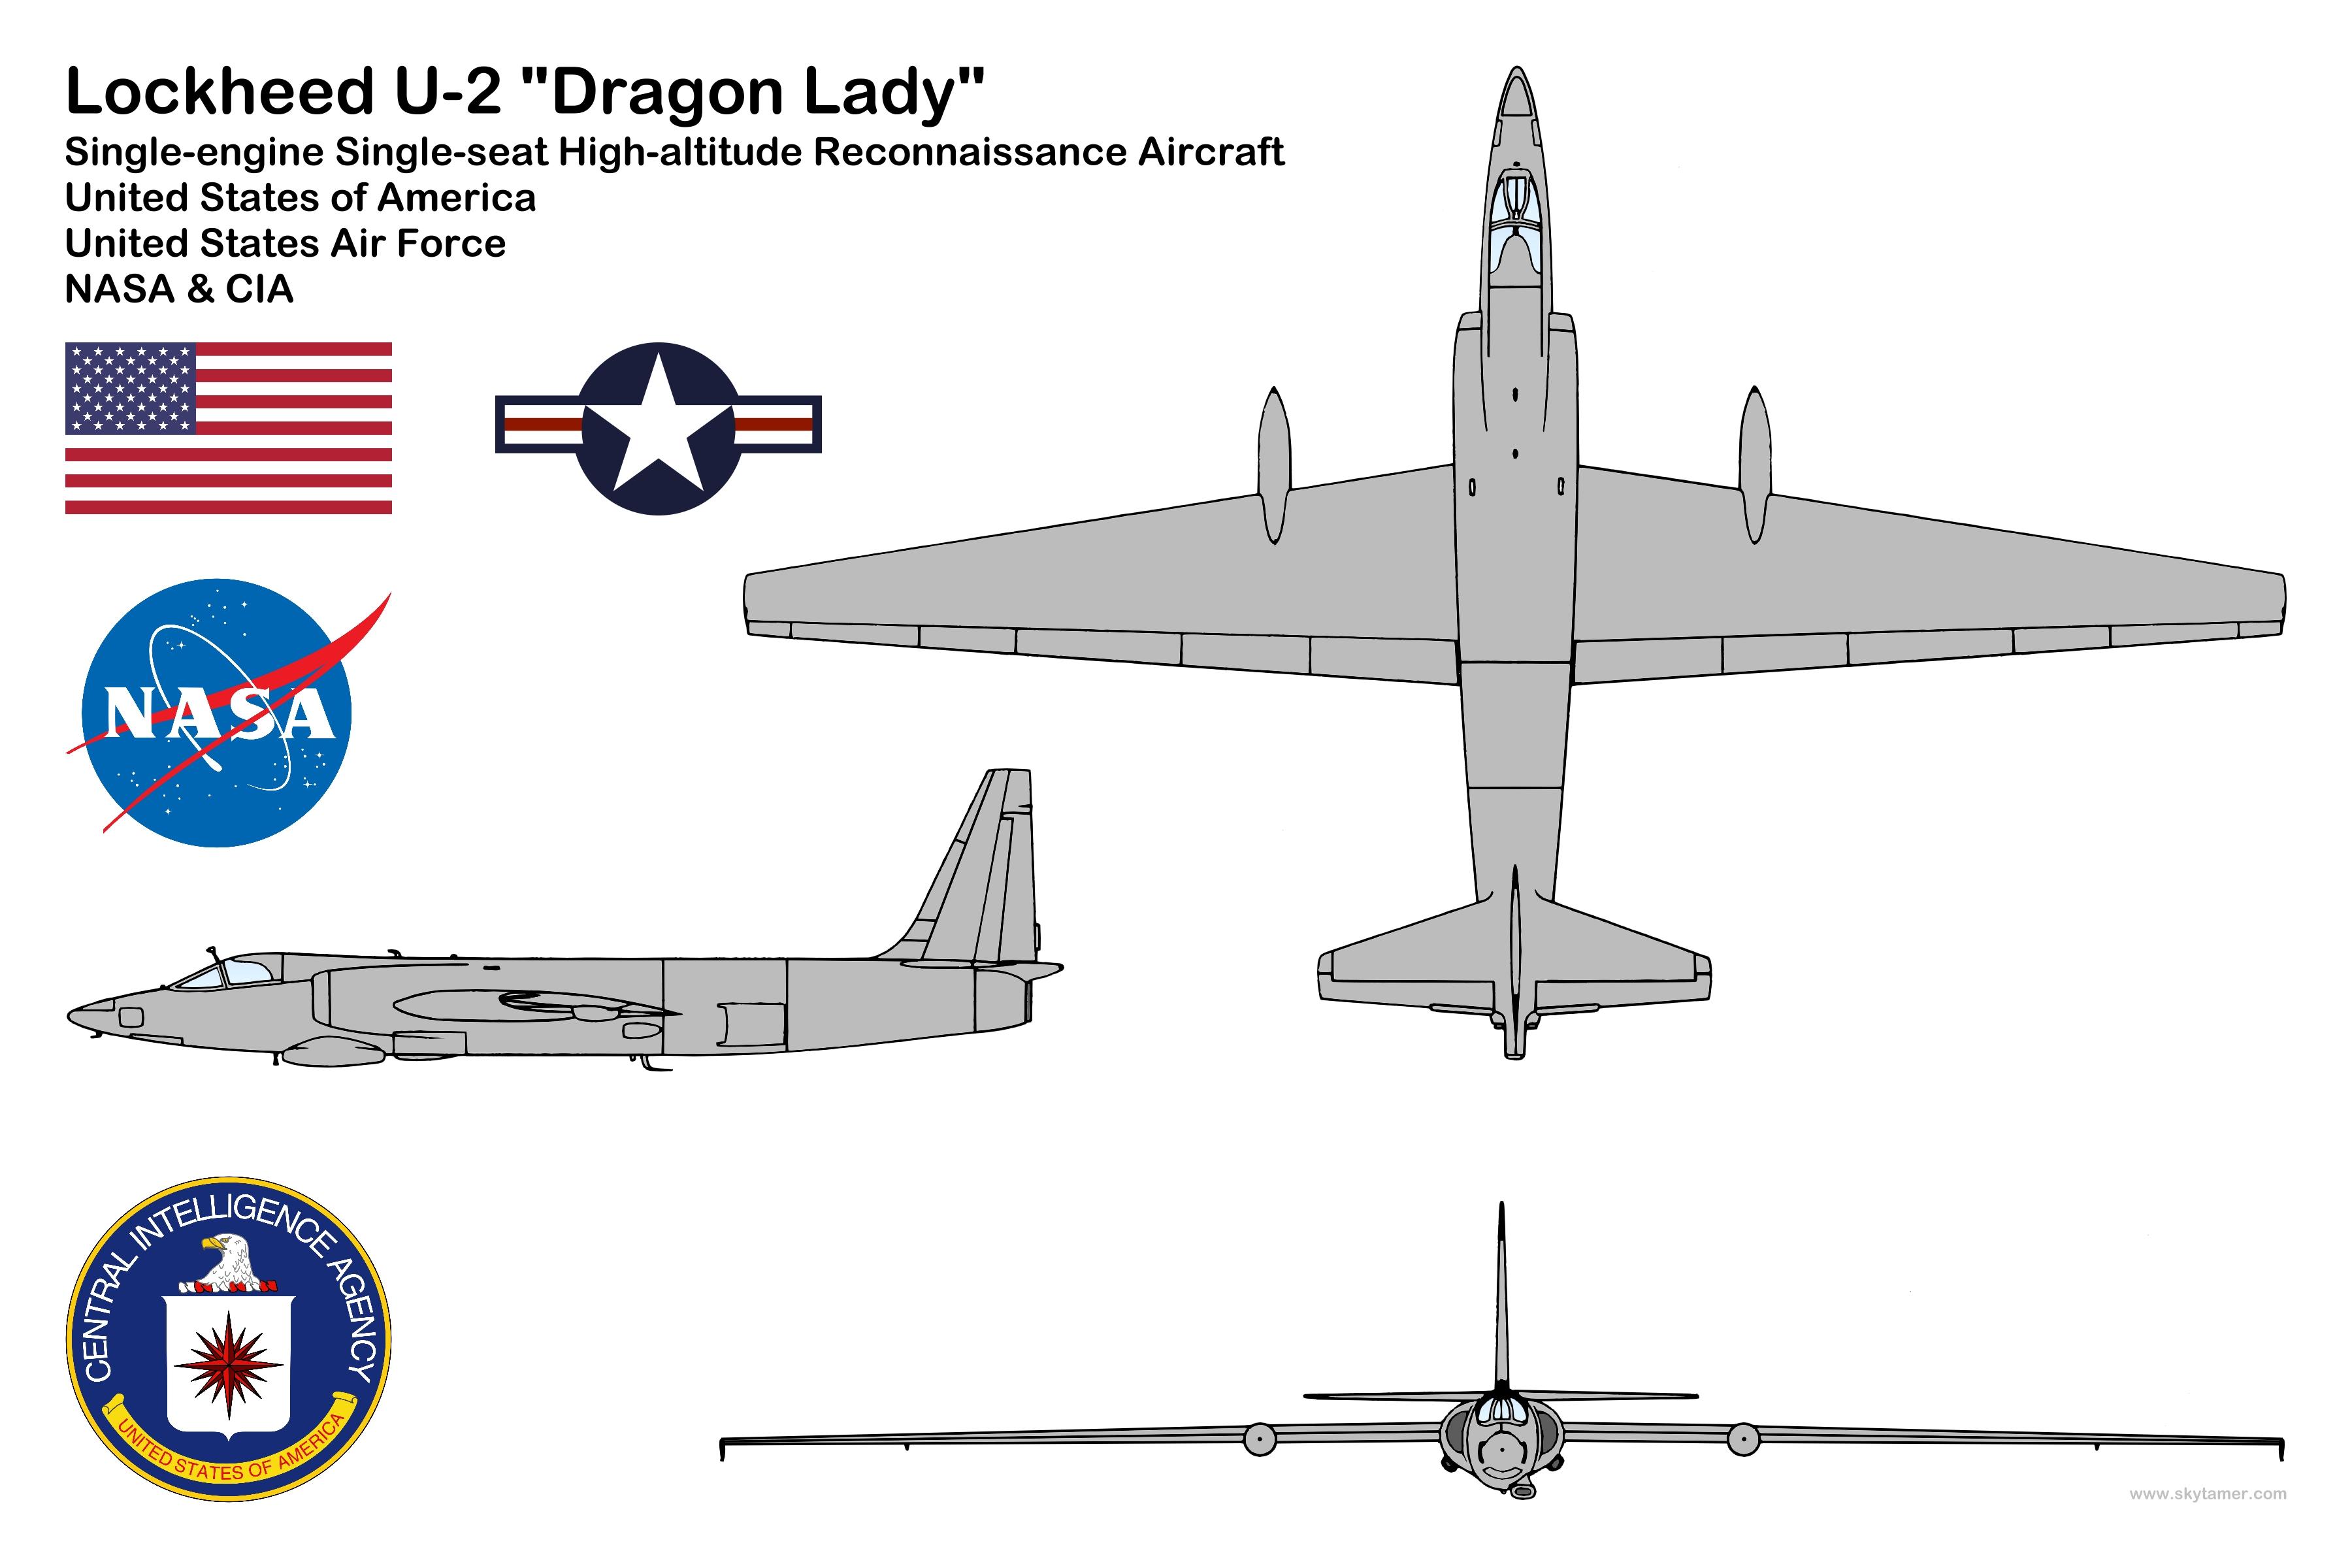 Plane View Drawing u2 Spy Plane 3 View Drawing